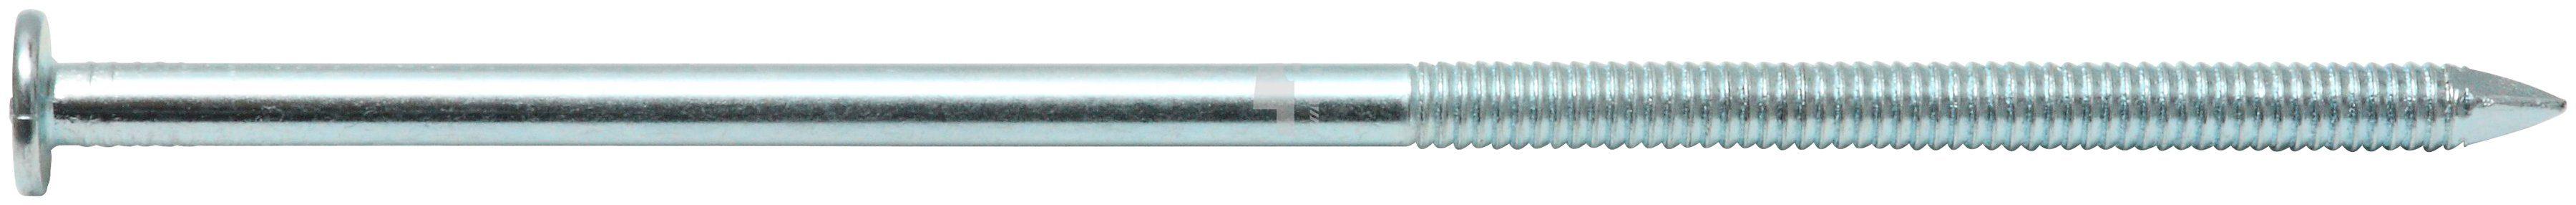 RAMSES Nagel , Sparrennägel 6 x 280 mm Stahl, 100 Stk.